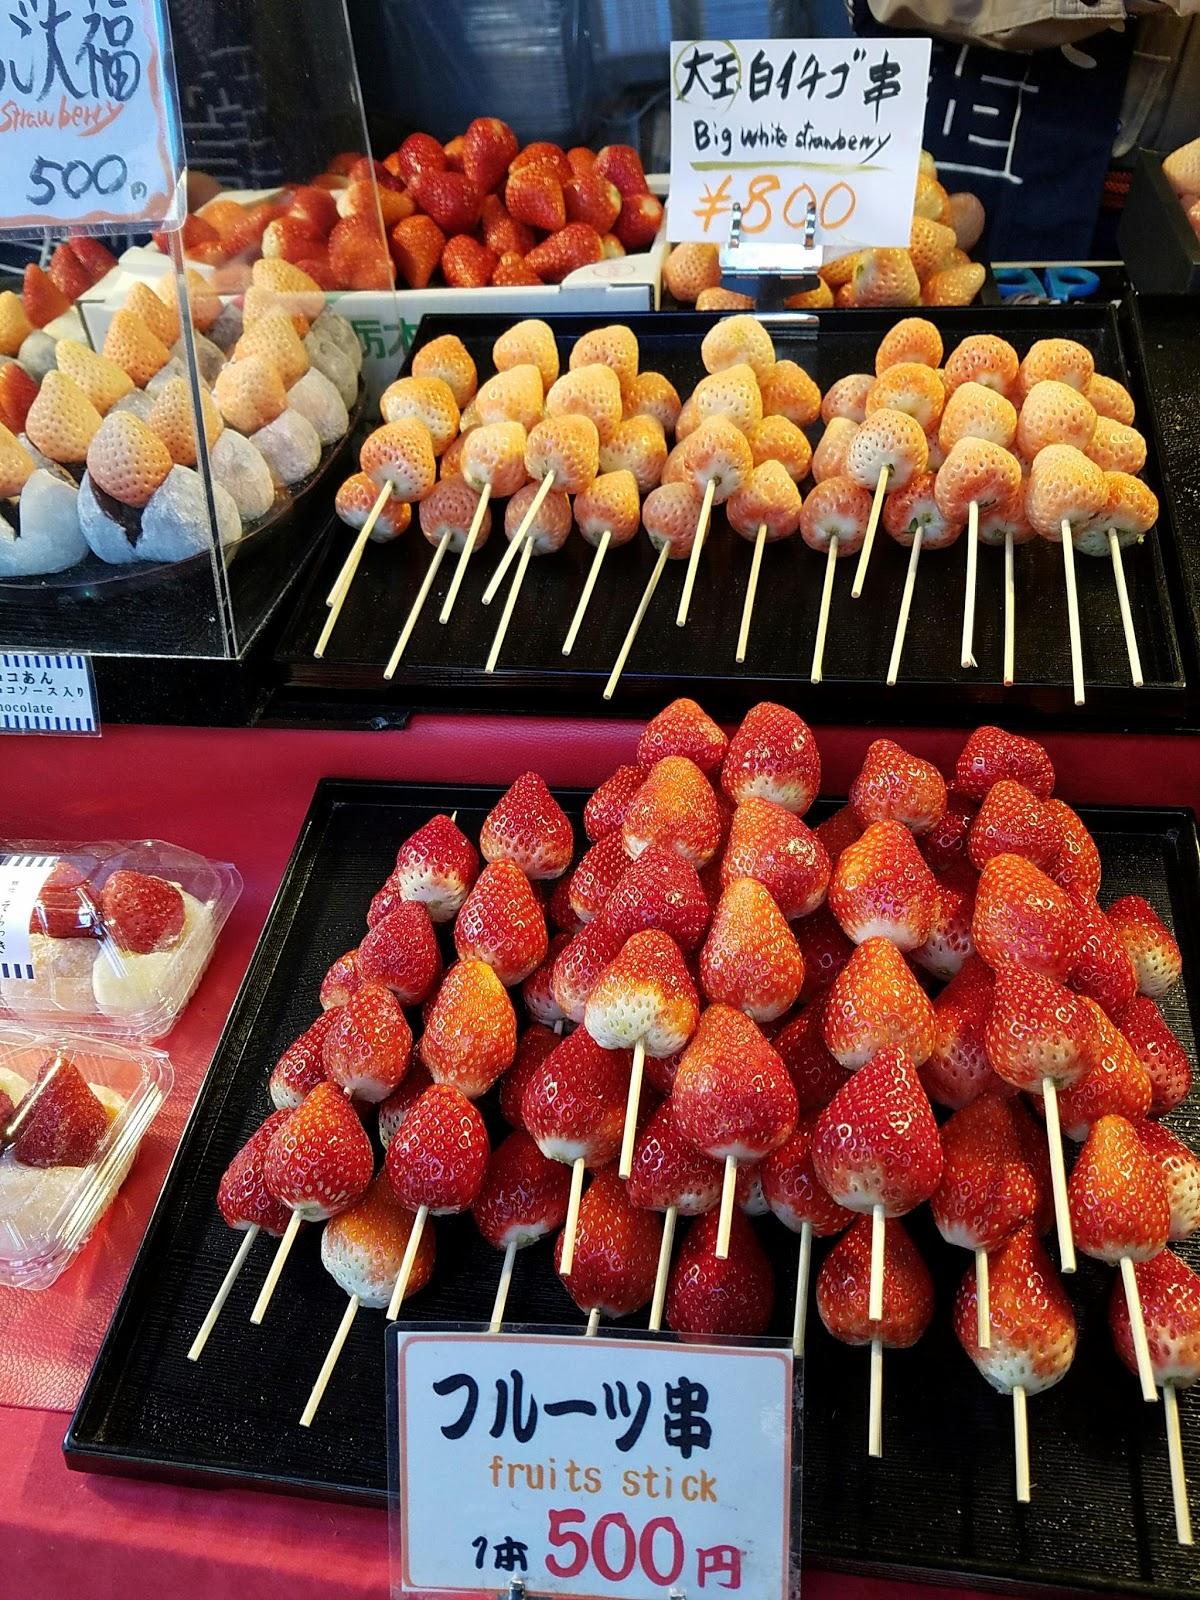 ichigo tokyo japan sweet delicious fruit